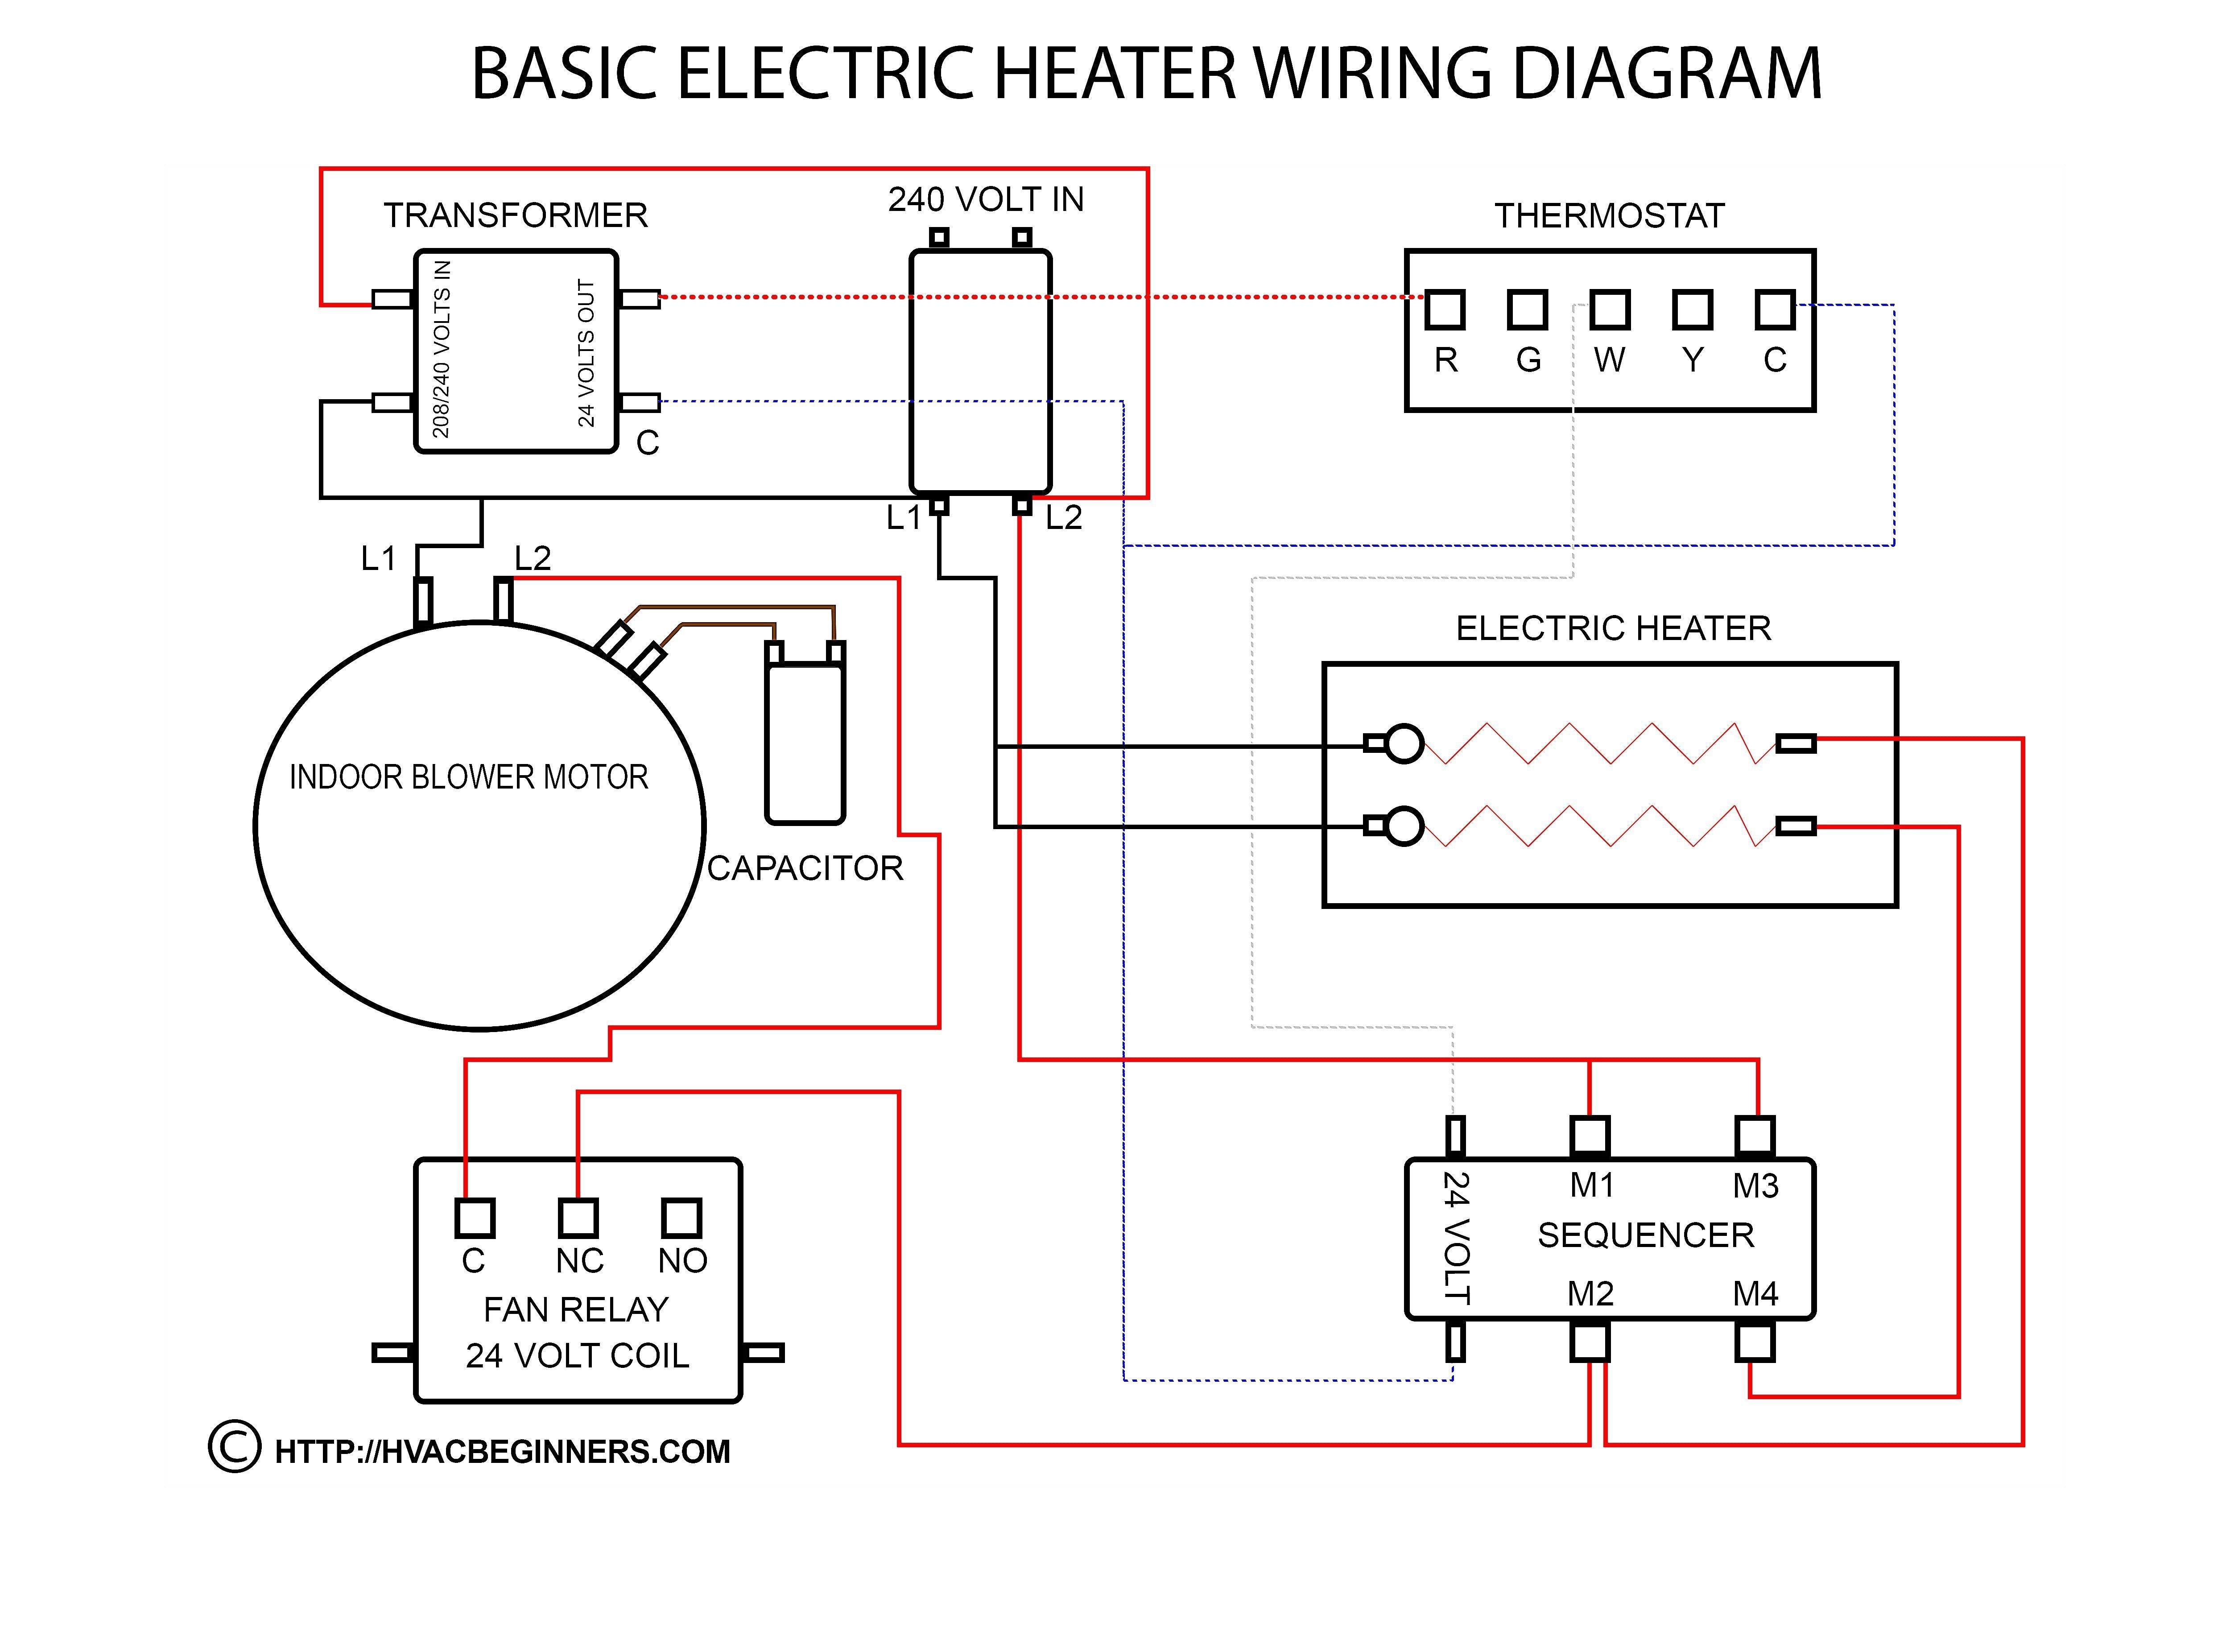 solar system wiring diagram Download-Solar Panel Wiring Diagram Example New Wiring Diagram for Trailer Valid Http Wikidiyfaqorguk 0 0d 3-f